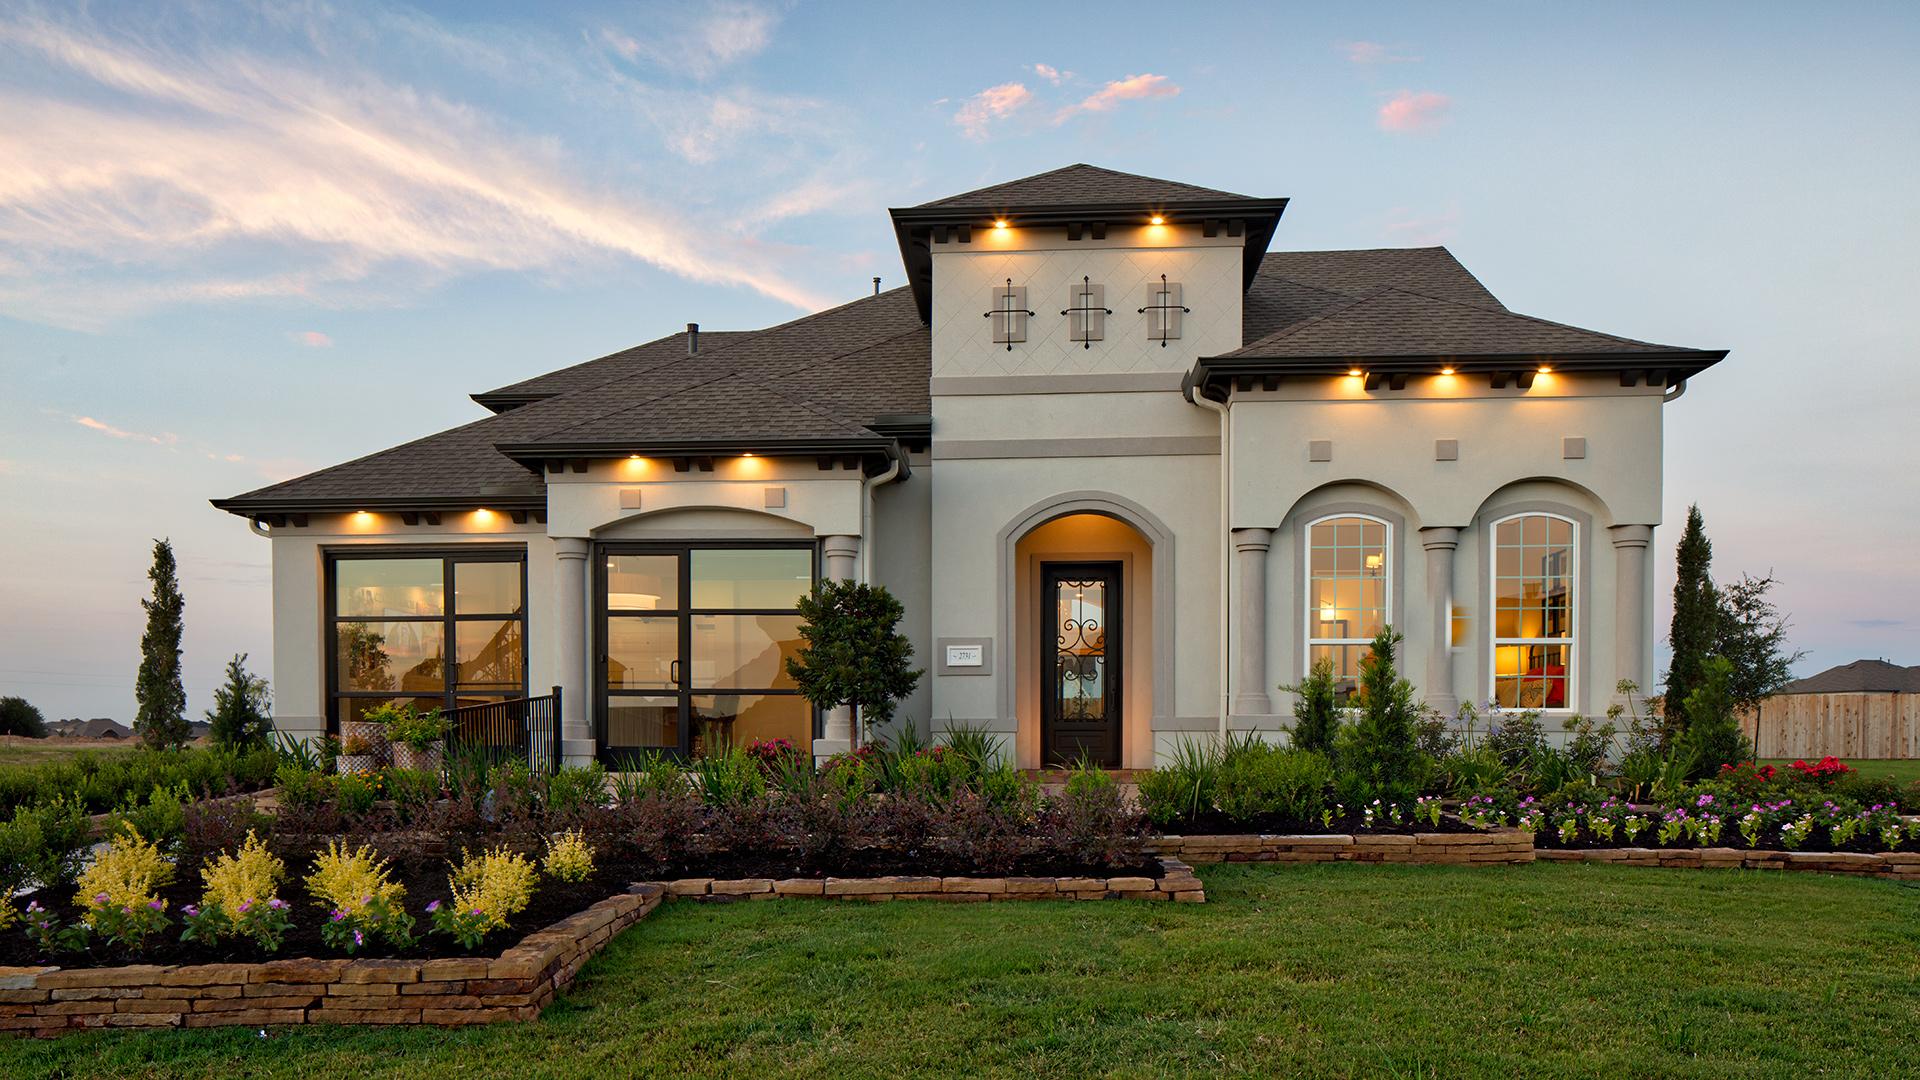 The Juniper Mediterranean Model - Now Open! Cinco Ranch - Katy, TX - Fort Bend County